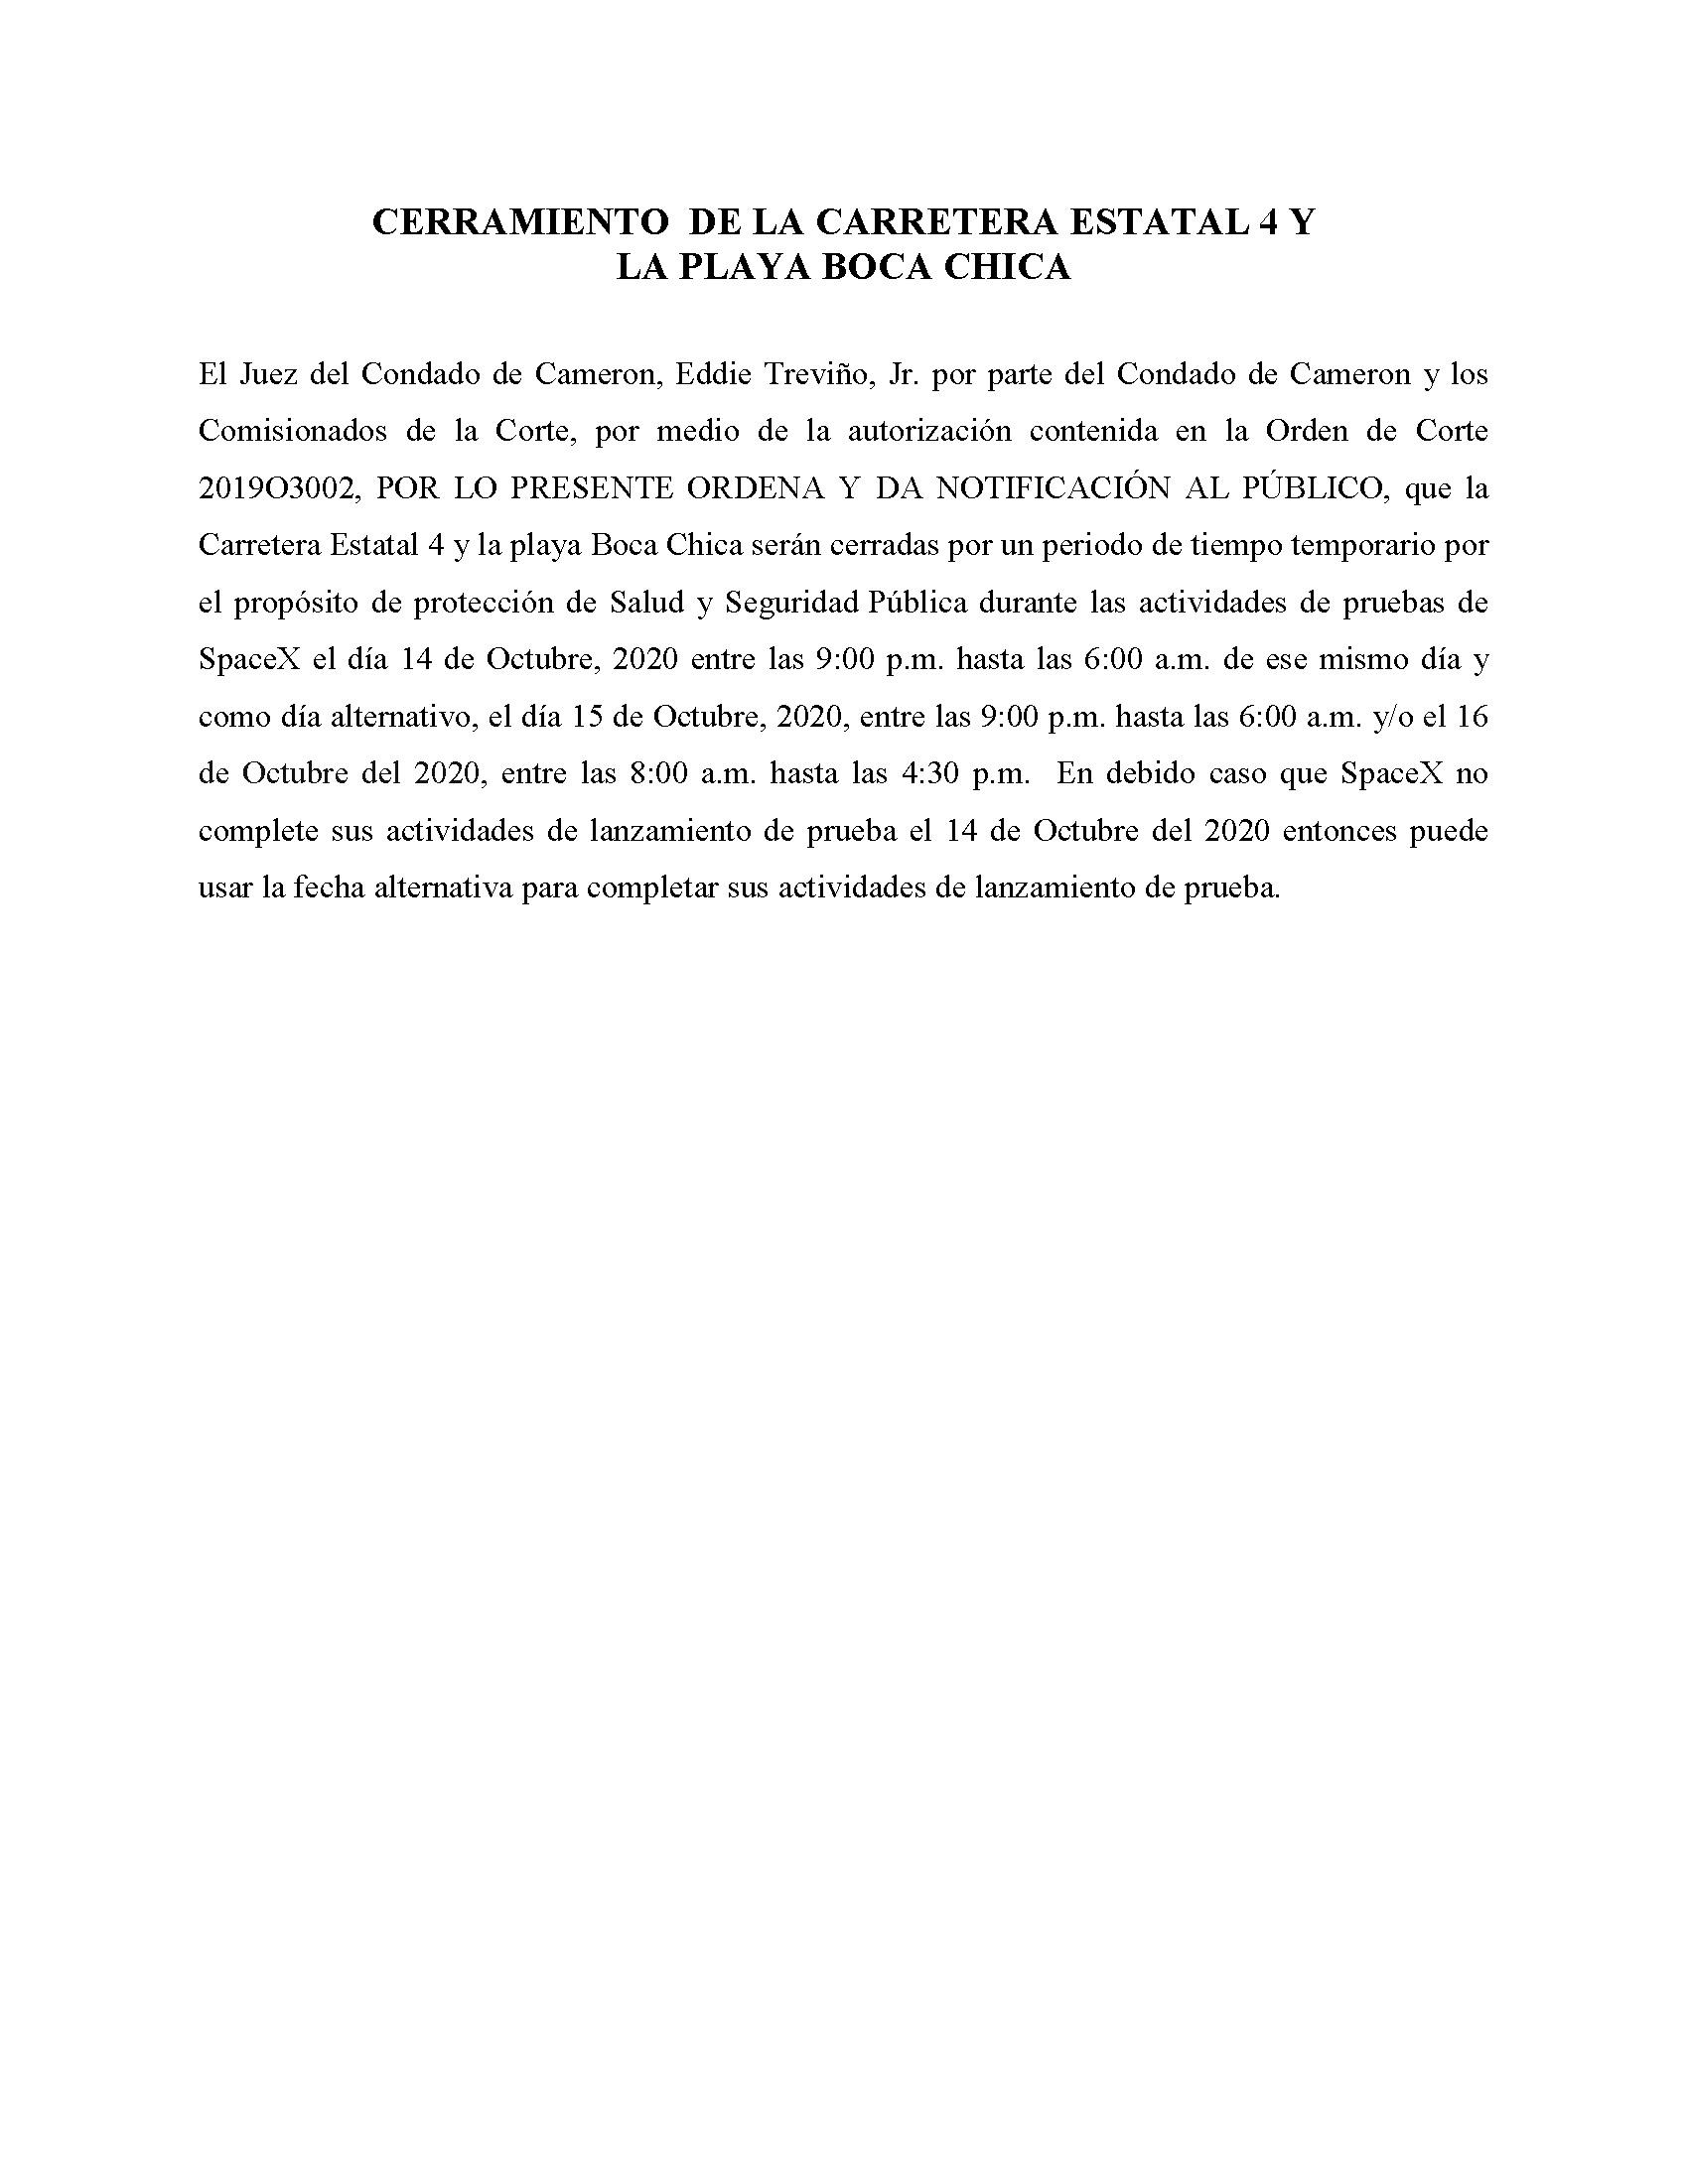 ORDER.CLOSURE OF HIGHWAY 4 Y LA PLAYA BOCA CHICA.SPANISH.10.14.20